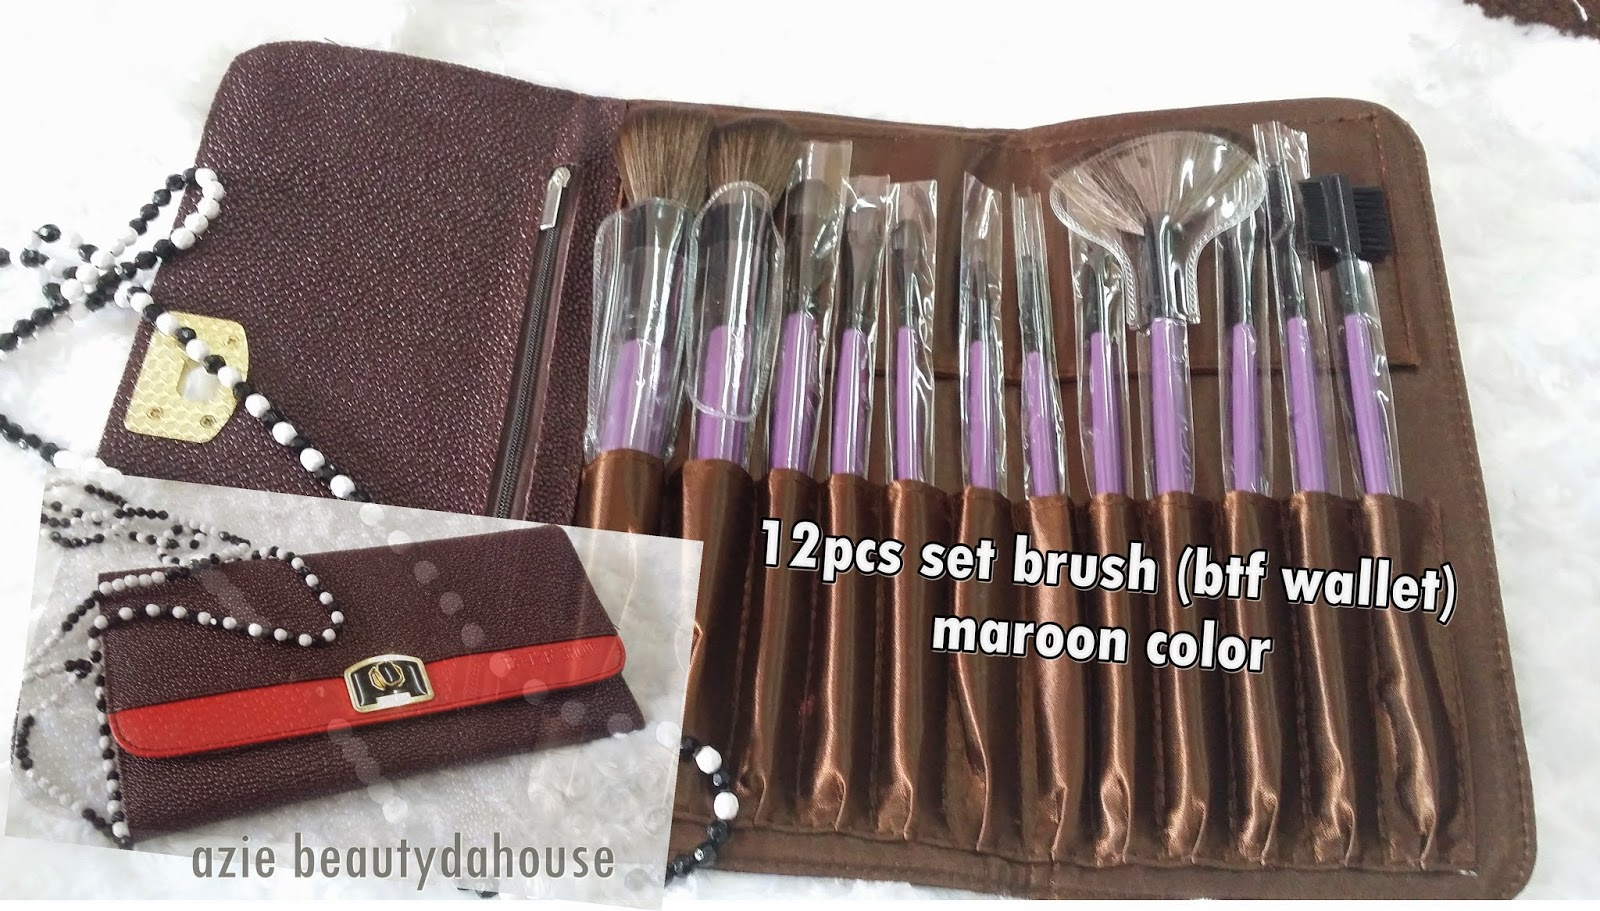 Azie Beauty Da House Makeup Brush Kluang All About Travelling Set  5pcs Soft Nylon Hair 12pcs Btf Wallet